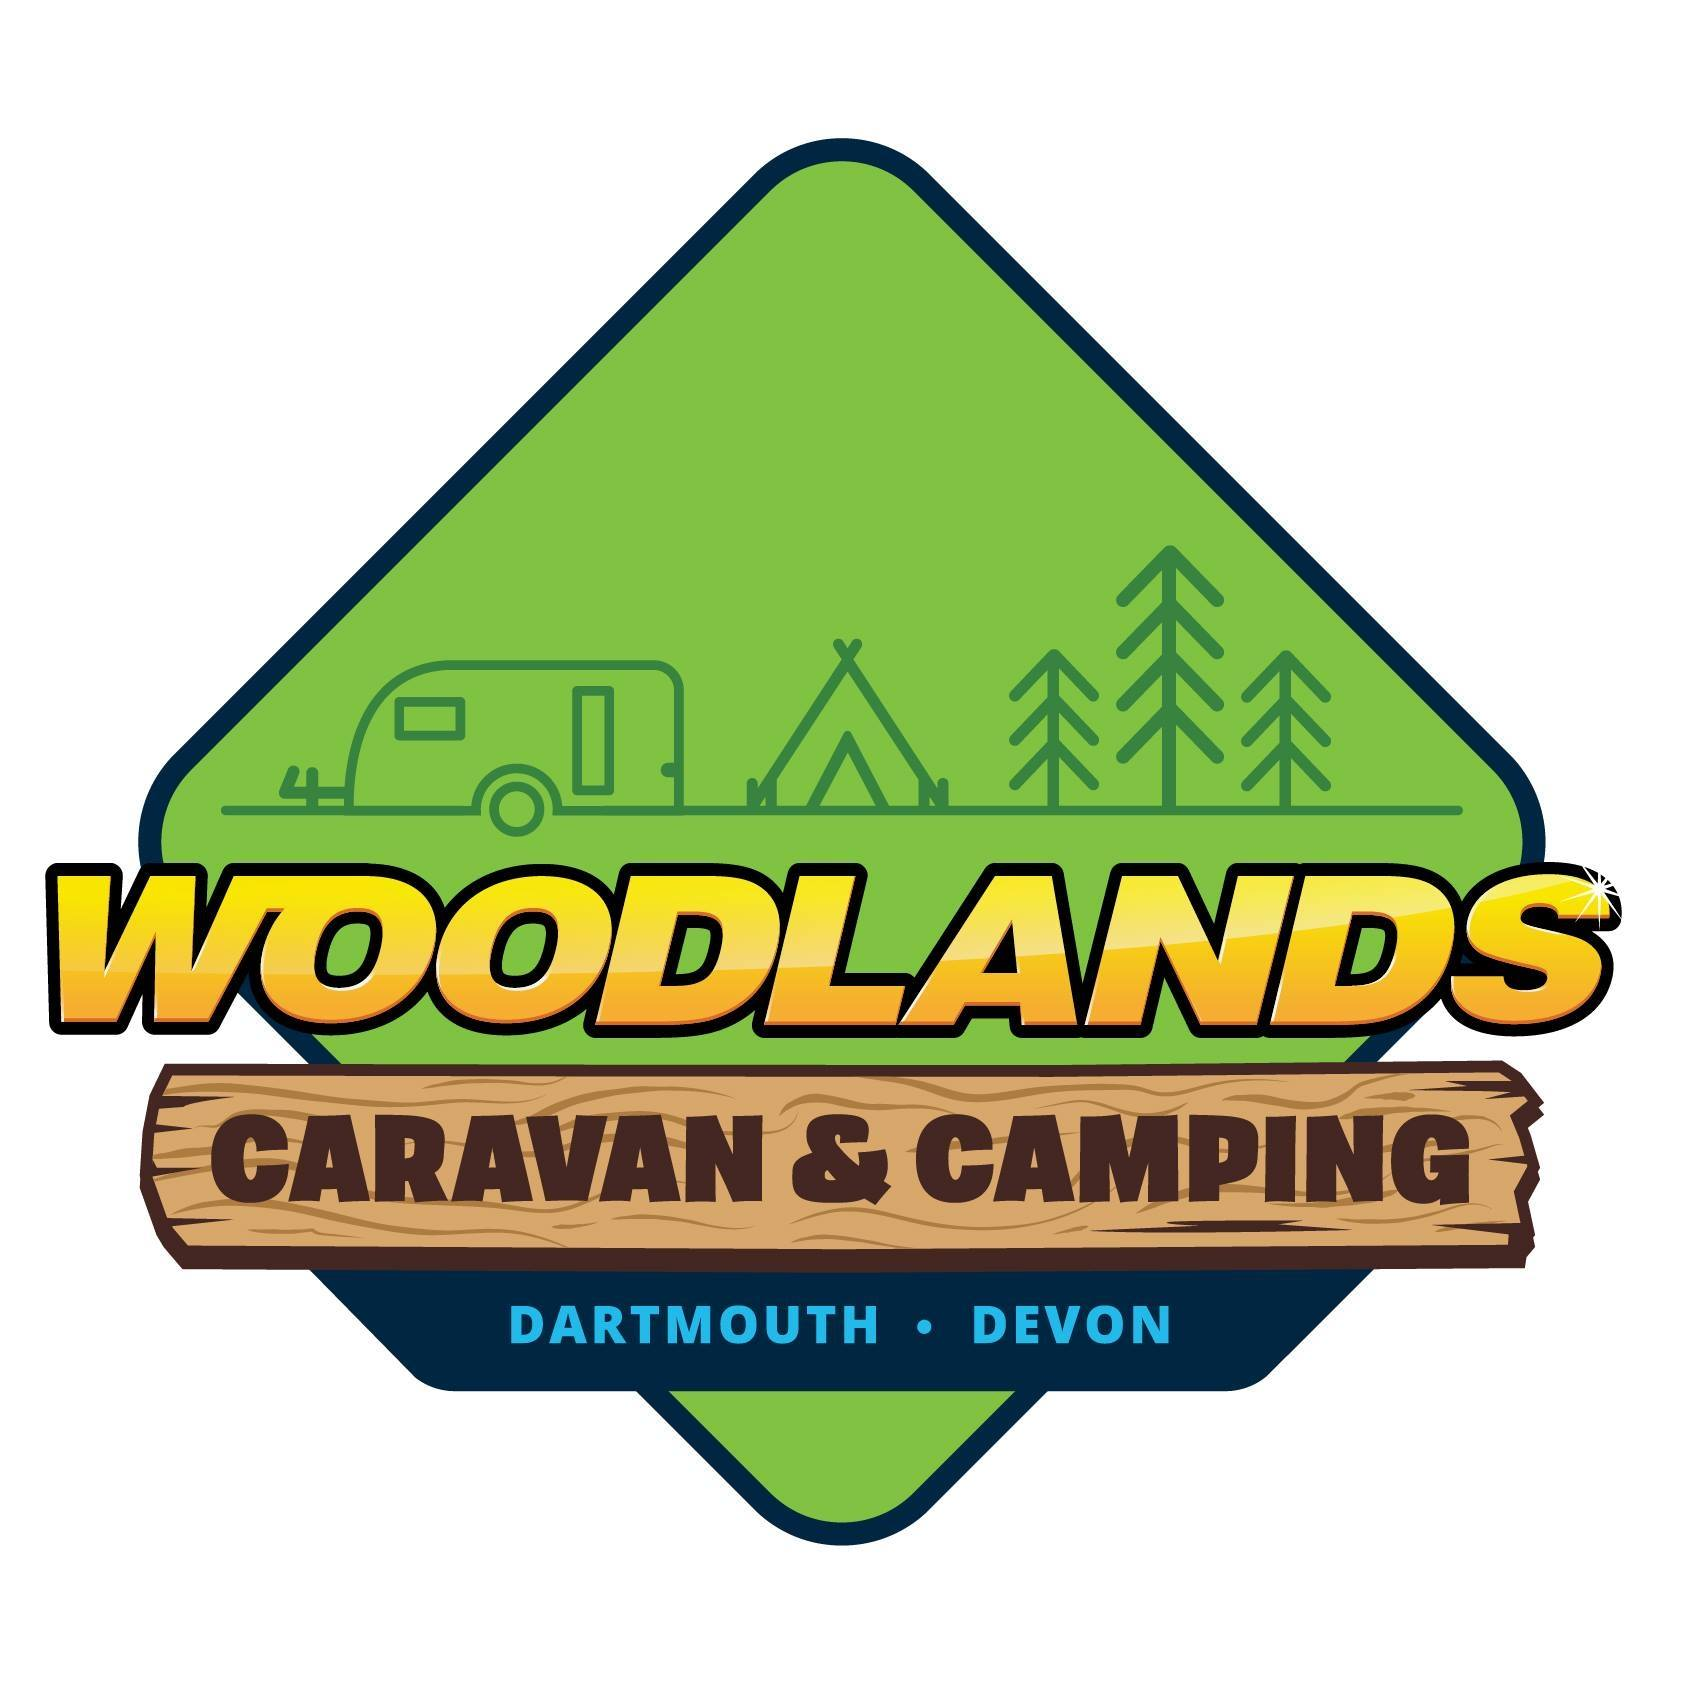 Woodlands Grove Caravan & Camping